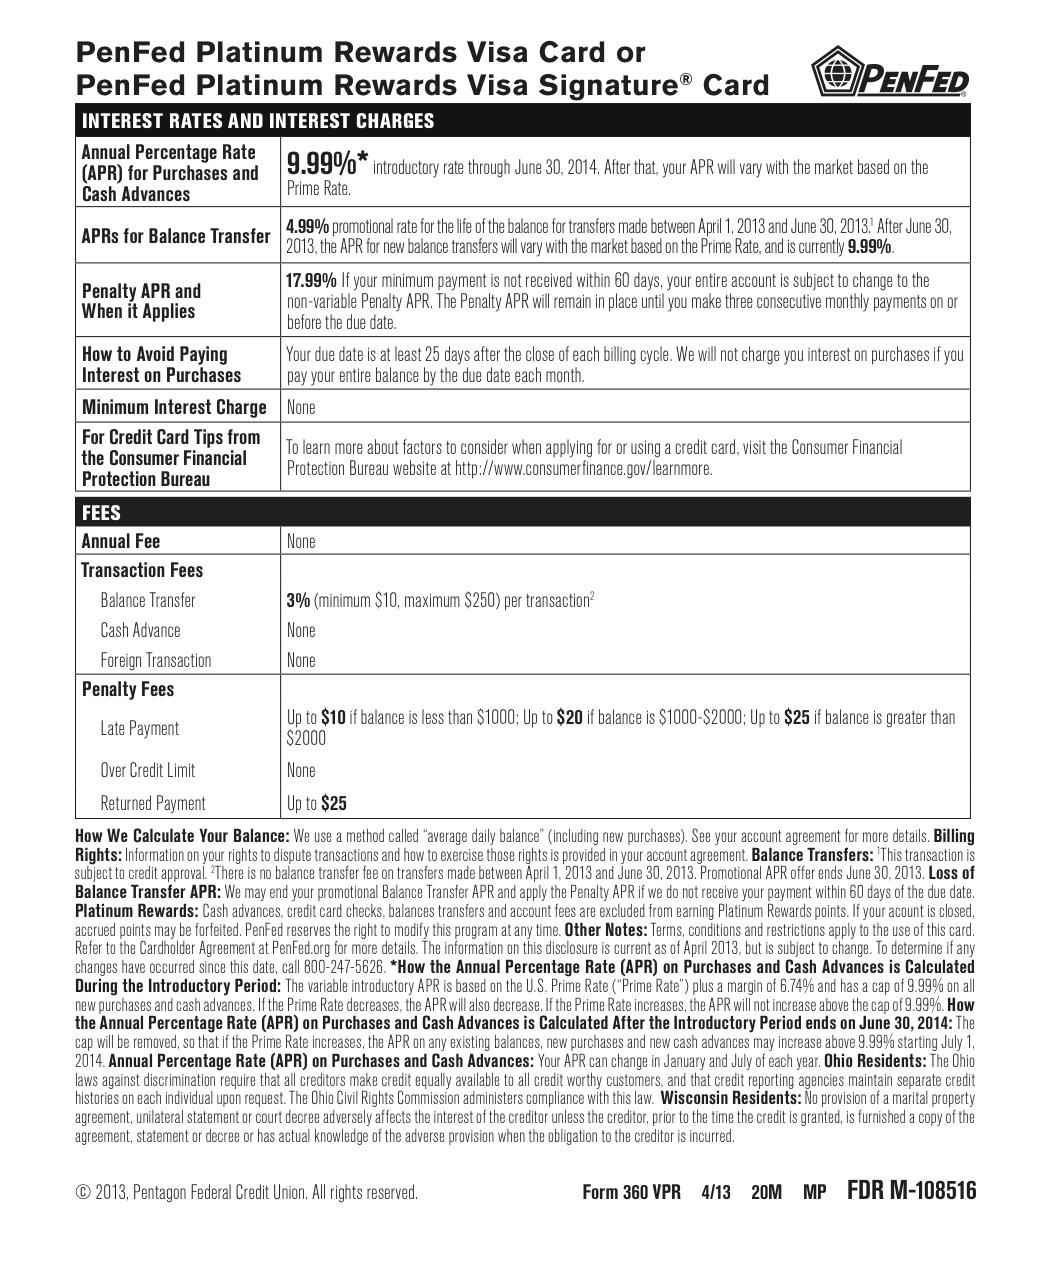 Form360-Visa-Platinum-Points-Summary-of-terms-Web-1.jpg